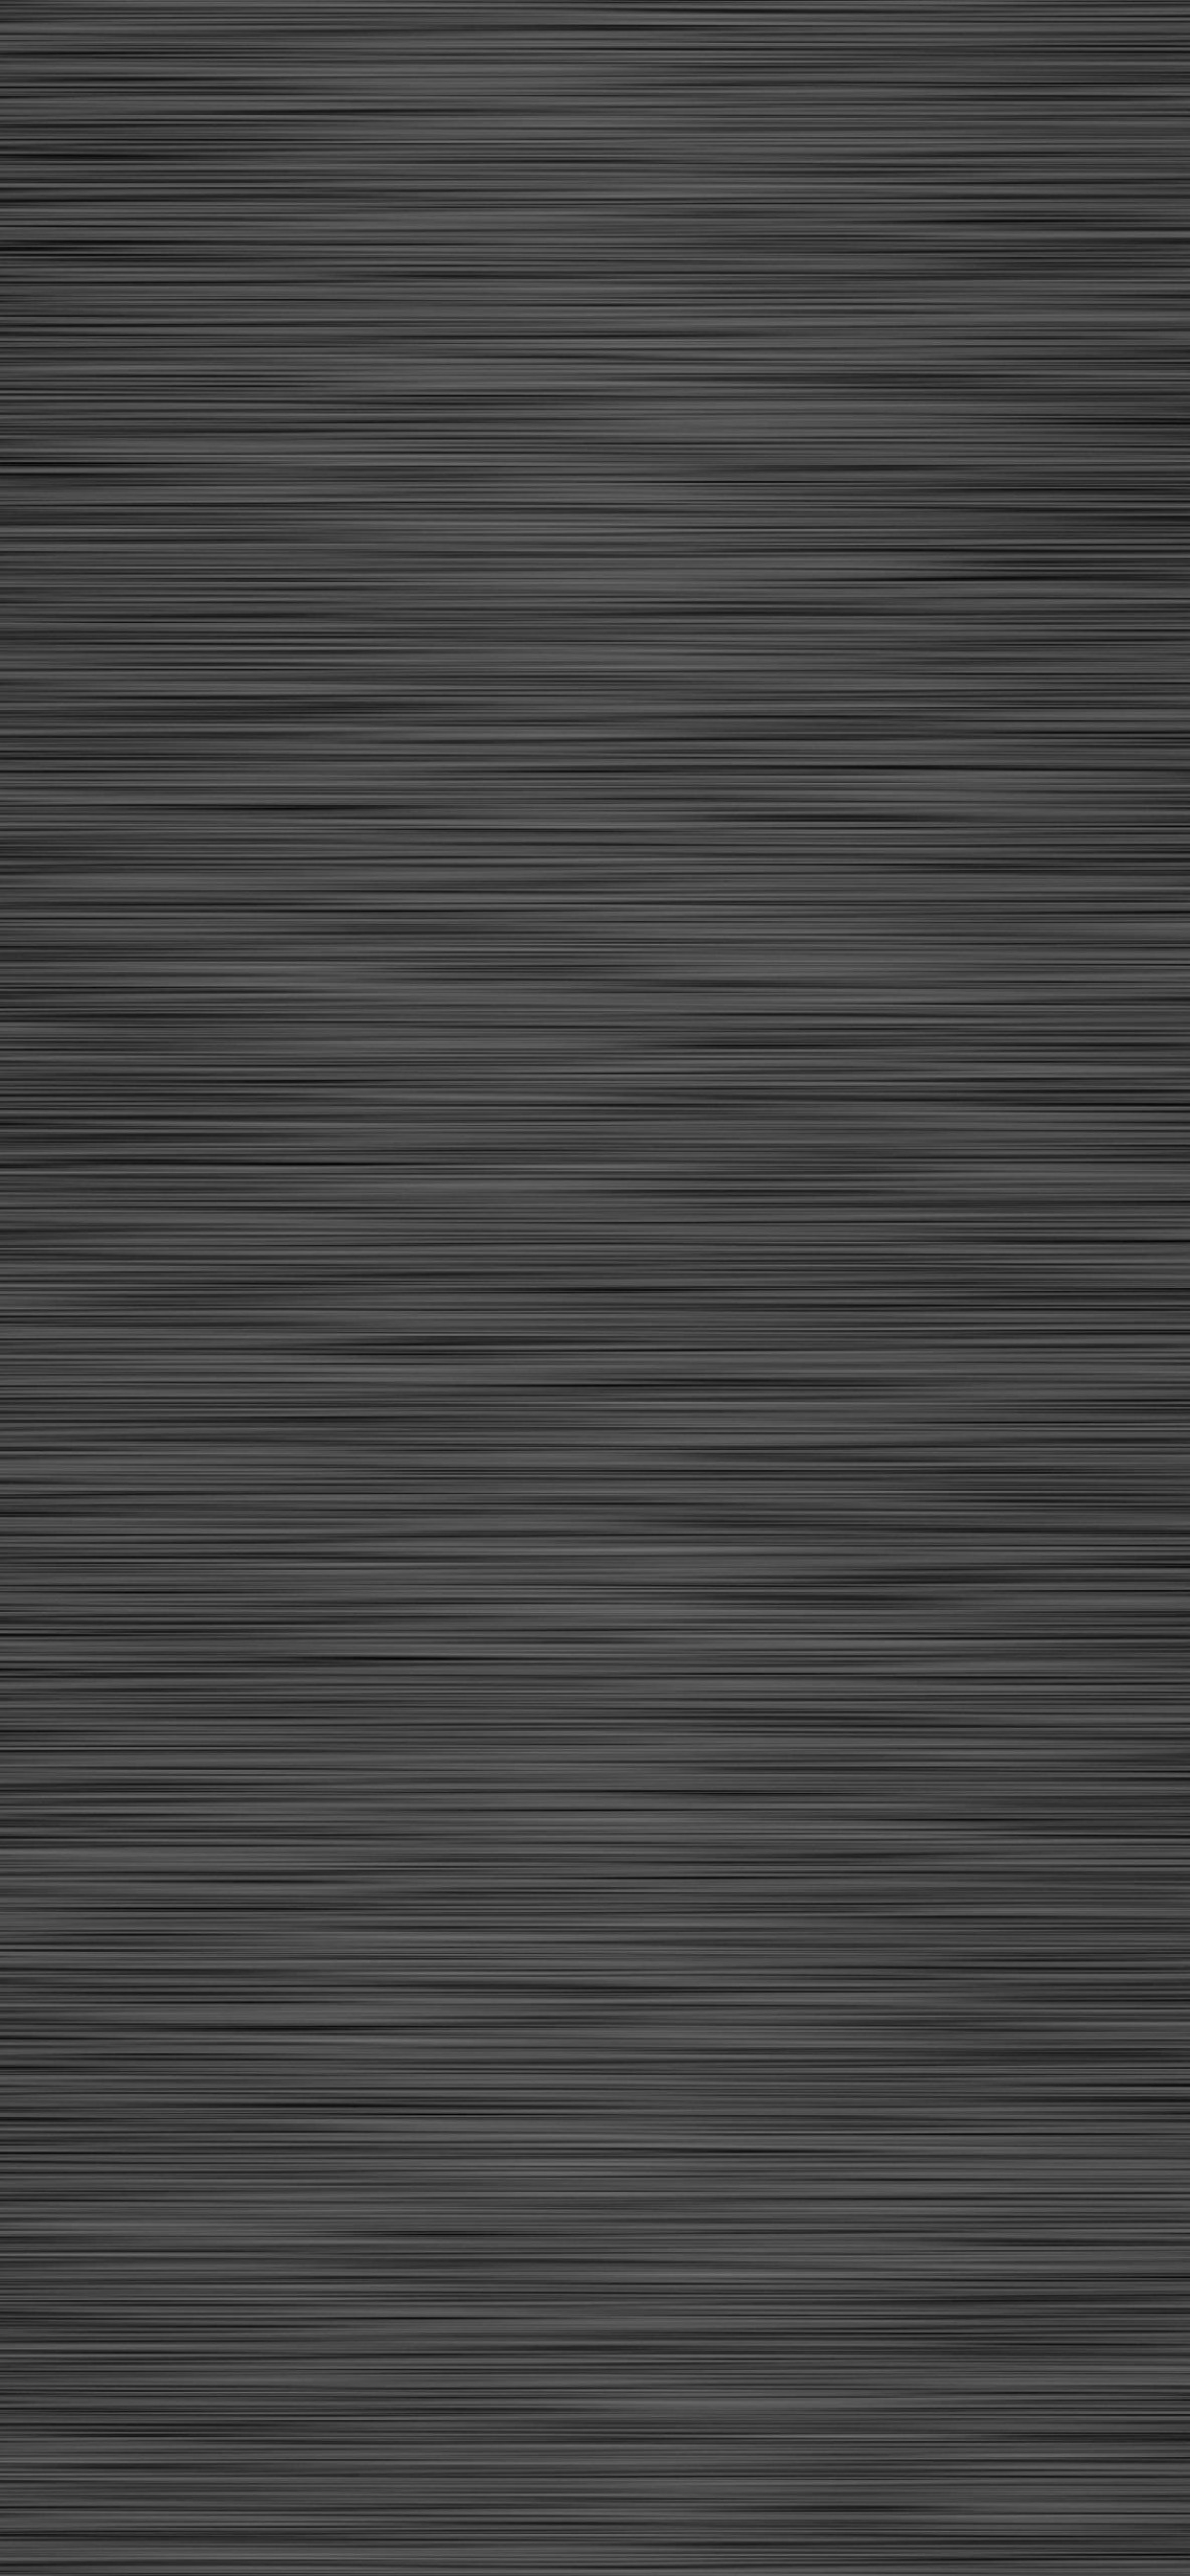 iPhone XS Max 壁紙 wallpaper 0259